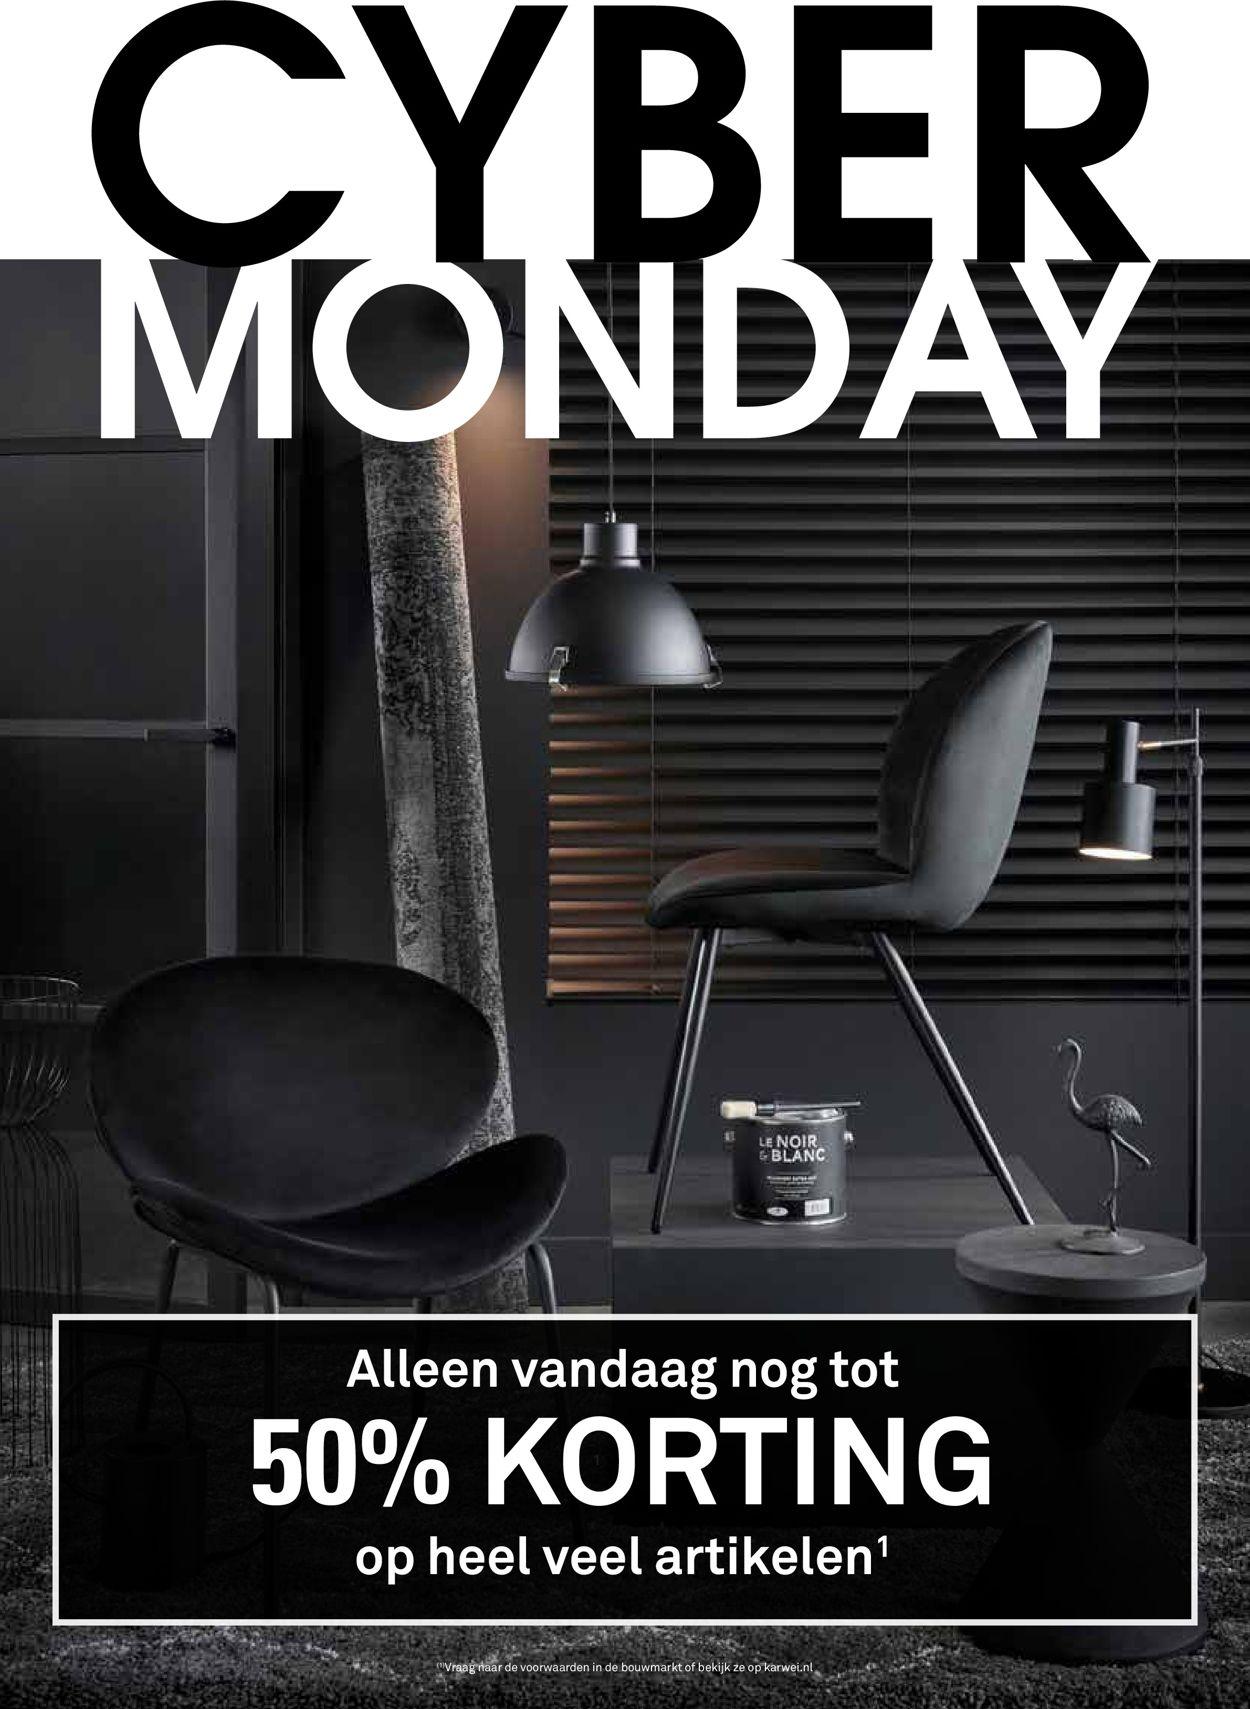 Karwei - Cyber Monday 2019 Folder - 02.12-08.12.2019